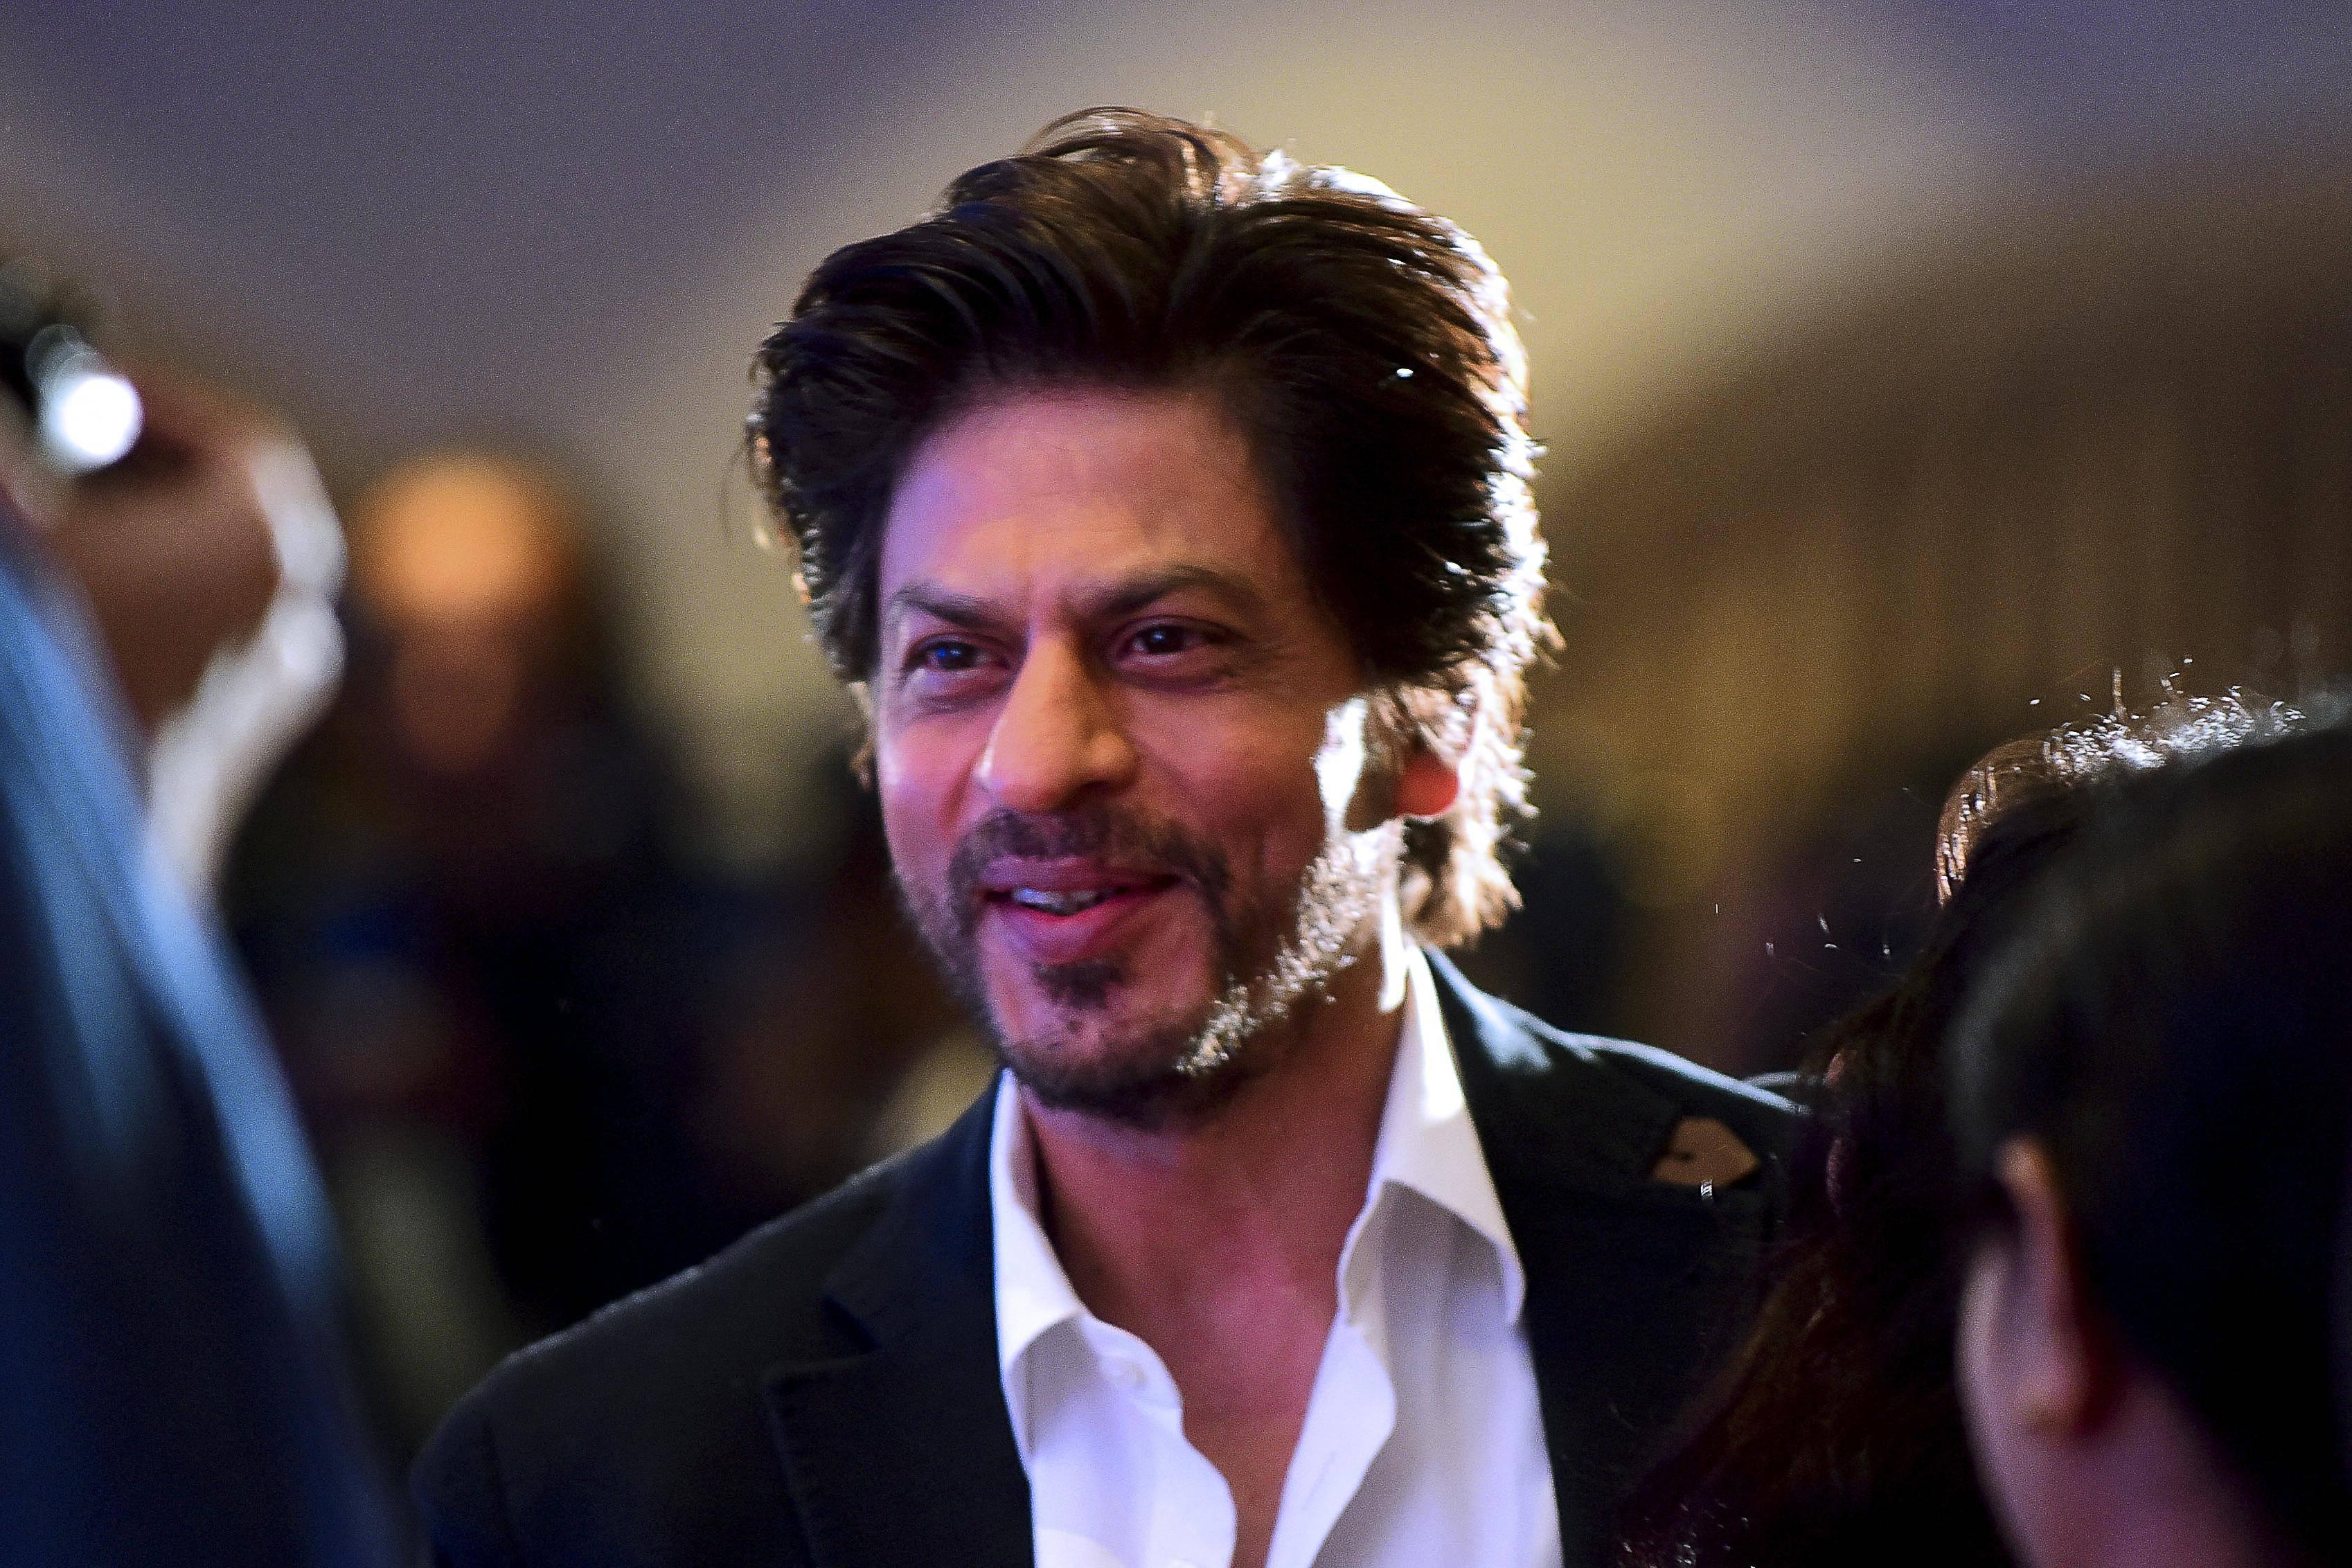 Bollywood: Shah Rukh Khan responds to Tom Hiddleston's appreciation for him